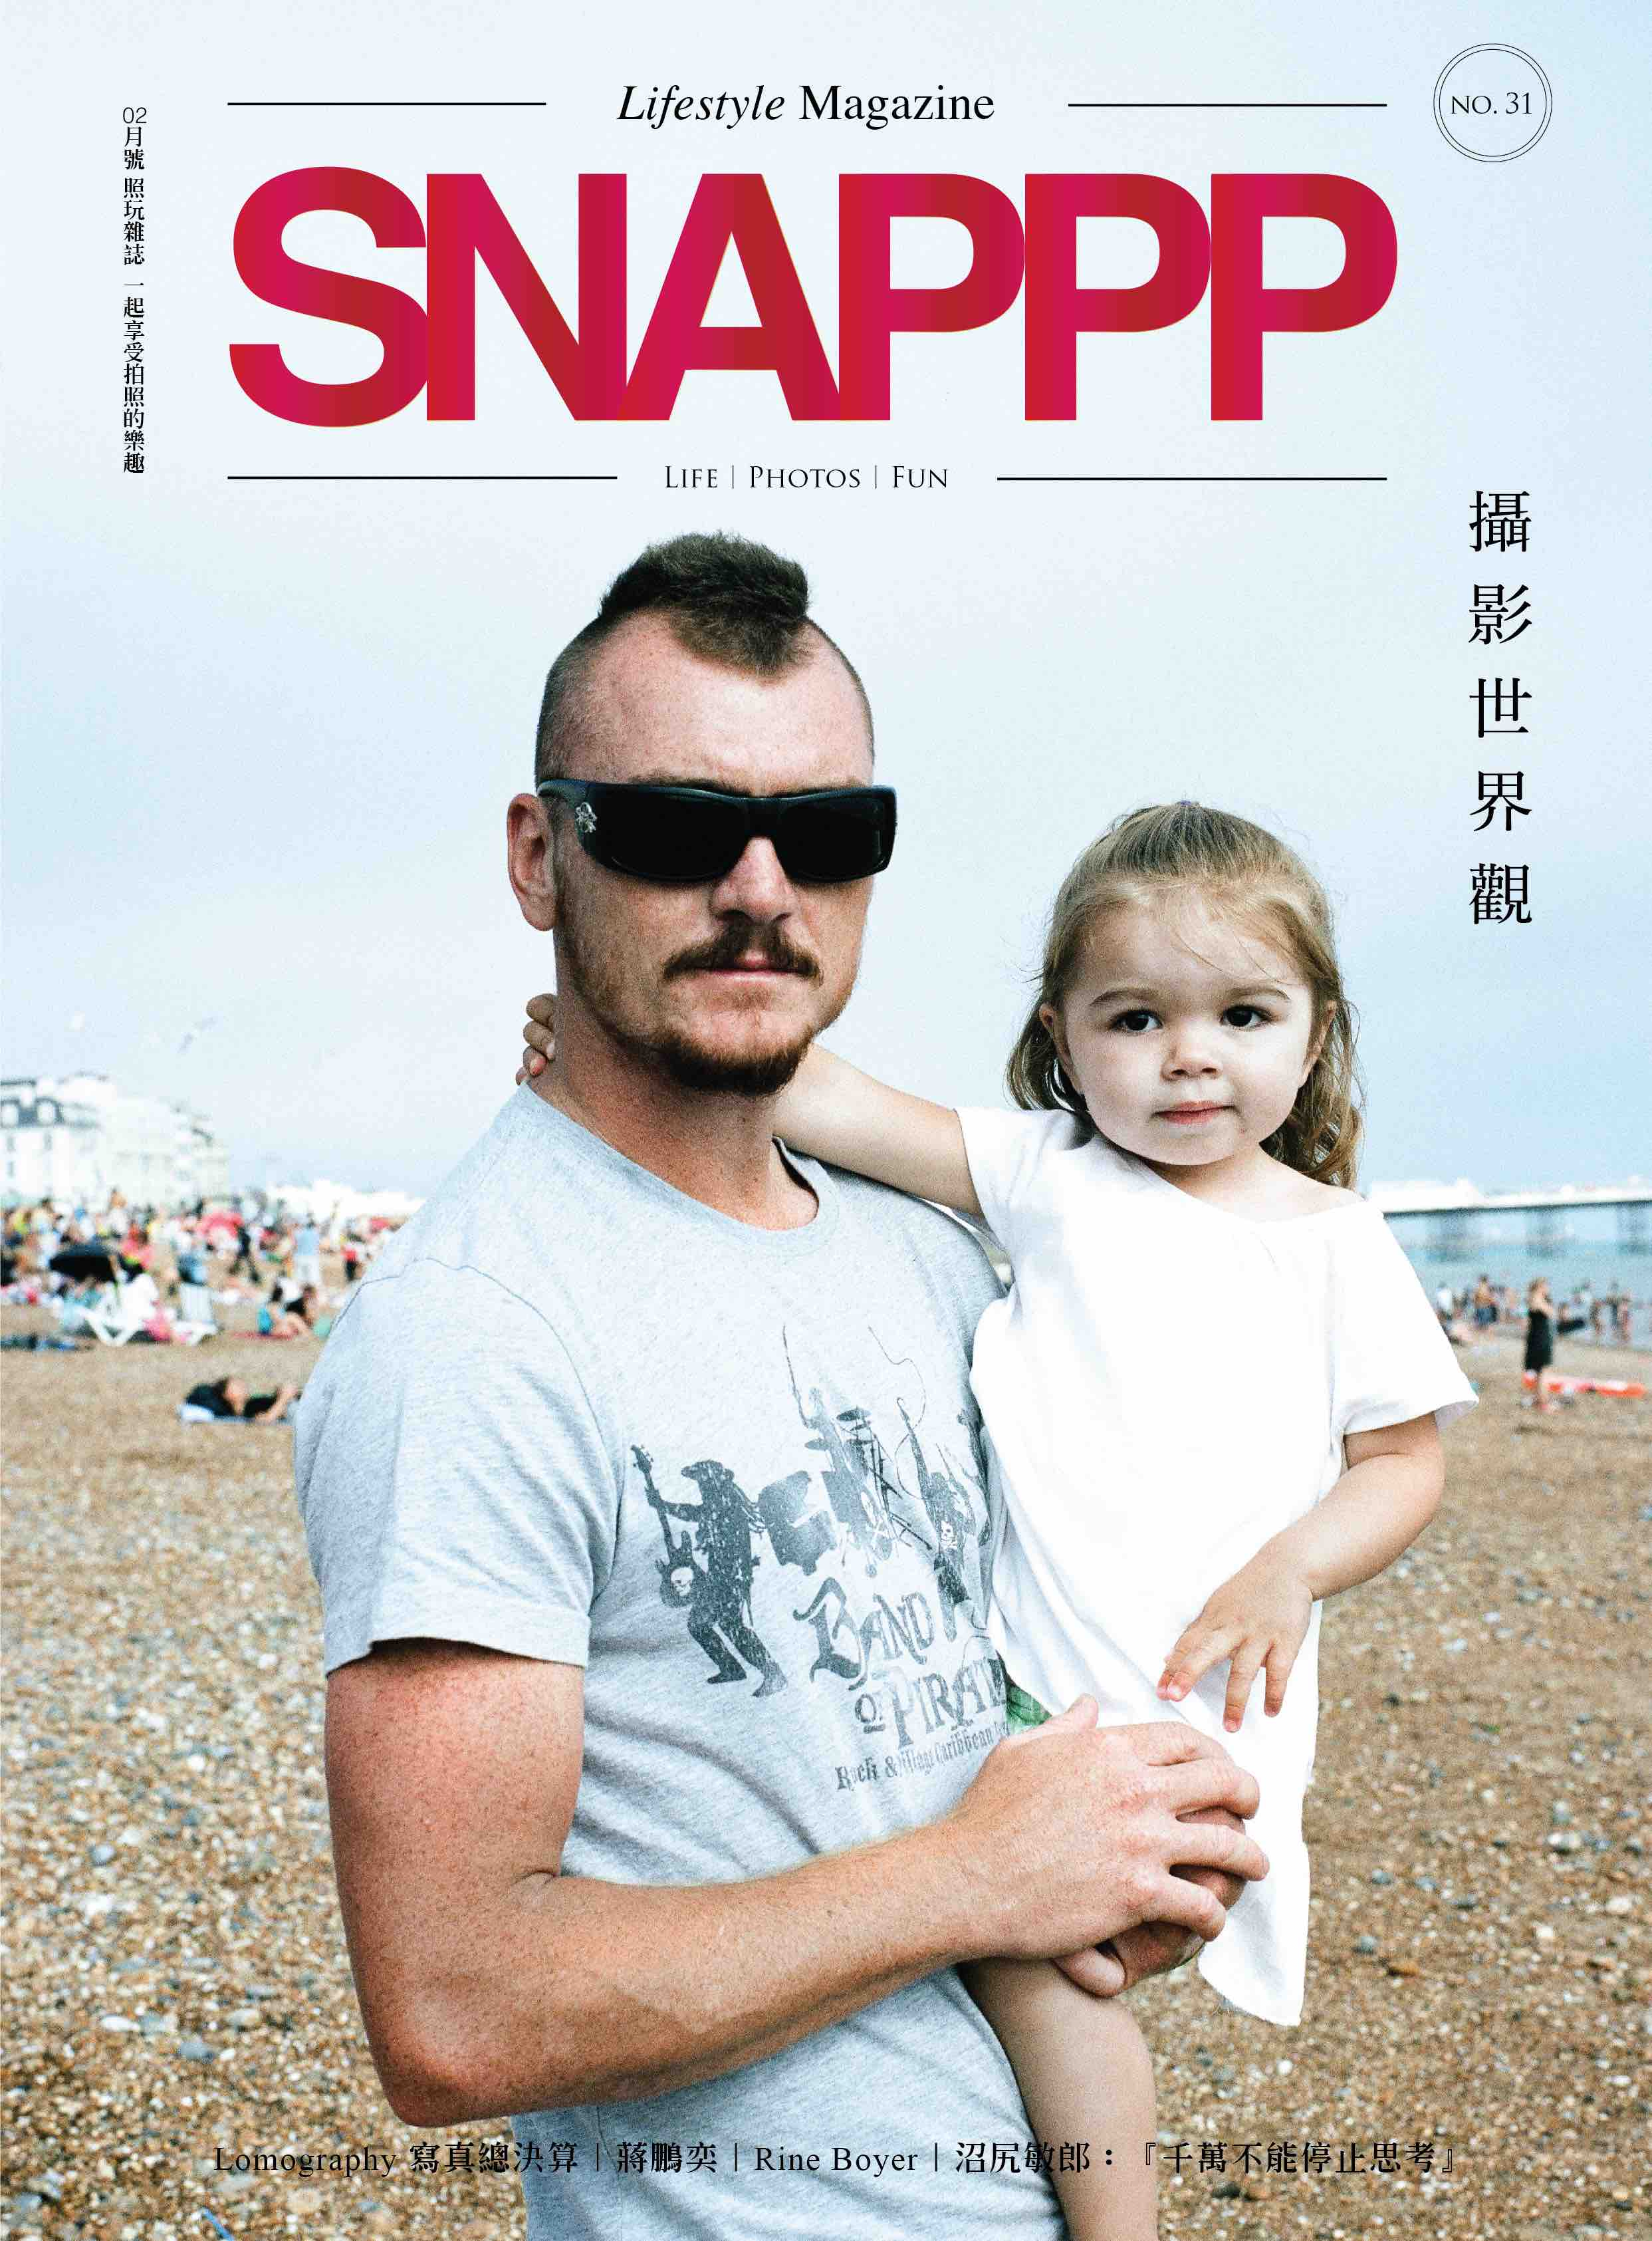 SNAPPP-NO31 COVER-ver1.jpg